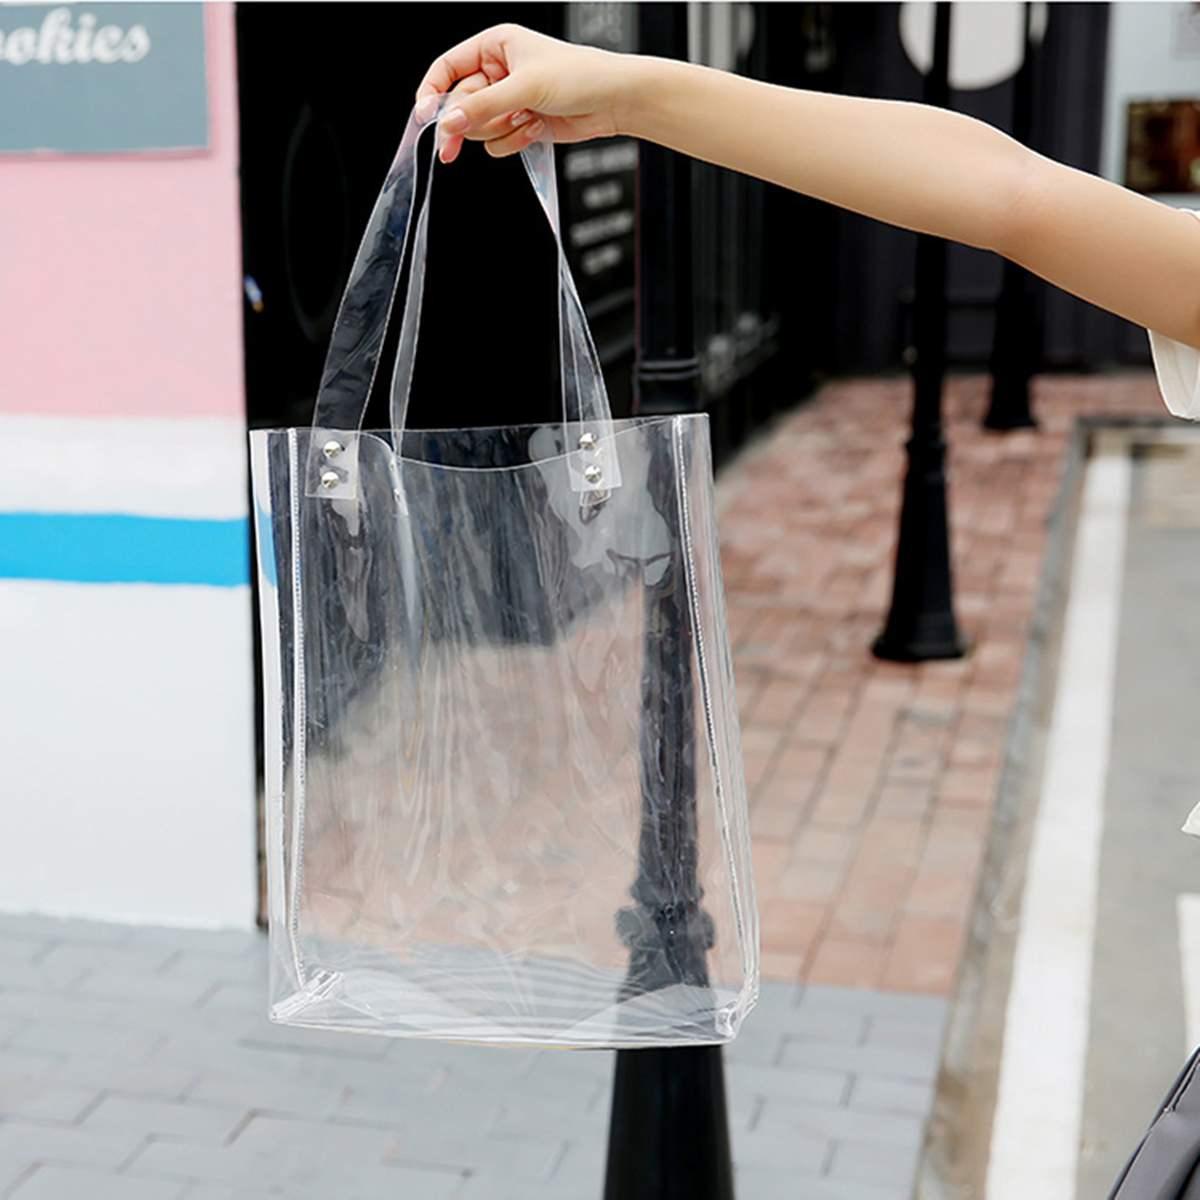 b94661732839 AEQUEEN 2019 Fashion Women Clear Transparent PVC Handbag Lady Shoulder  Plastic Bag Tote Shipping Shopper Bag